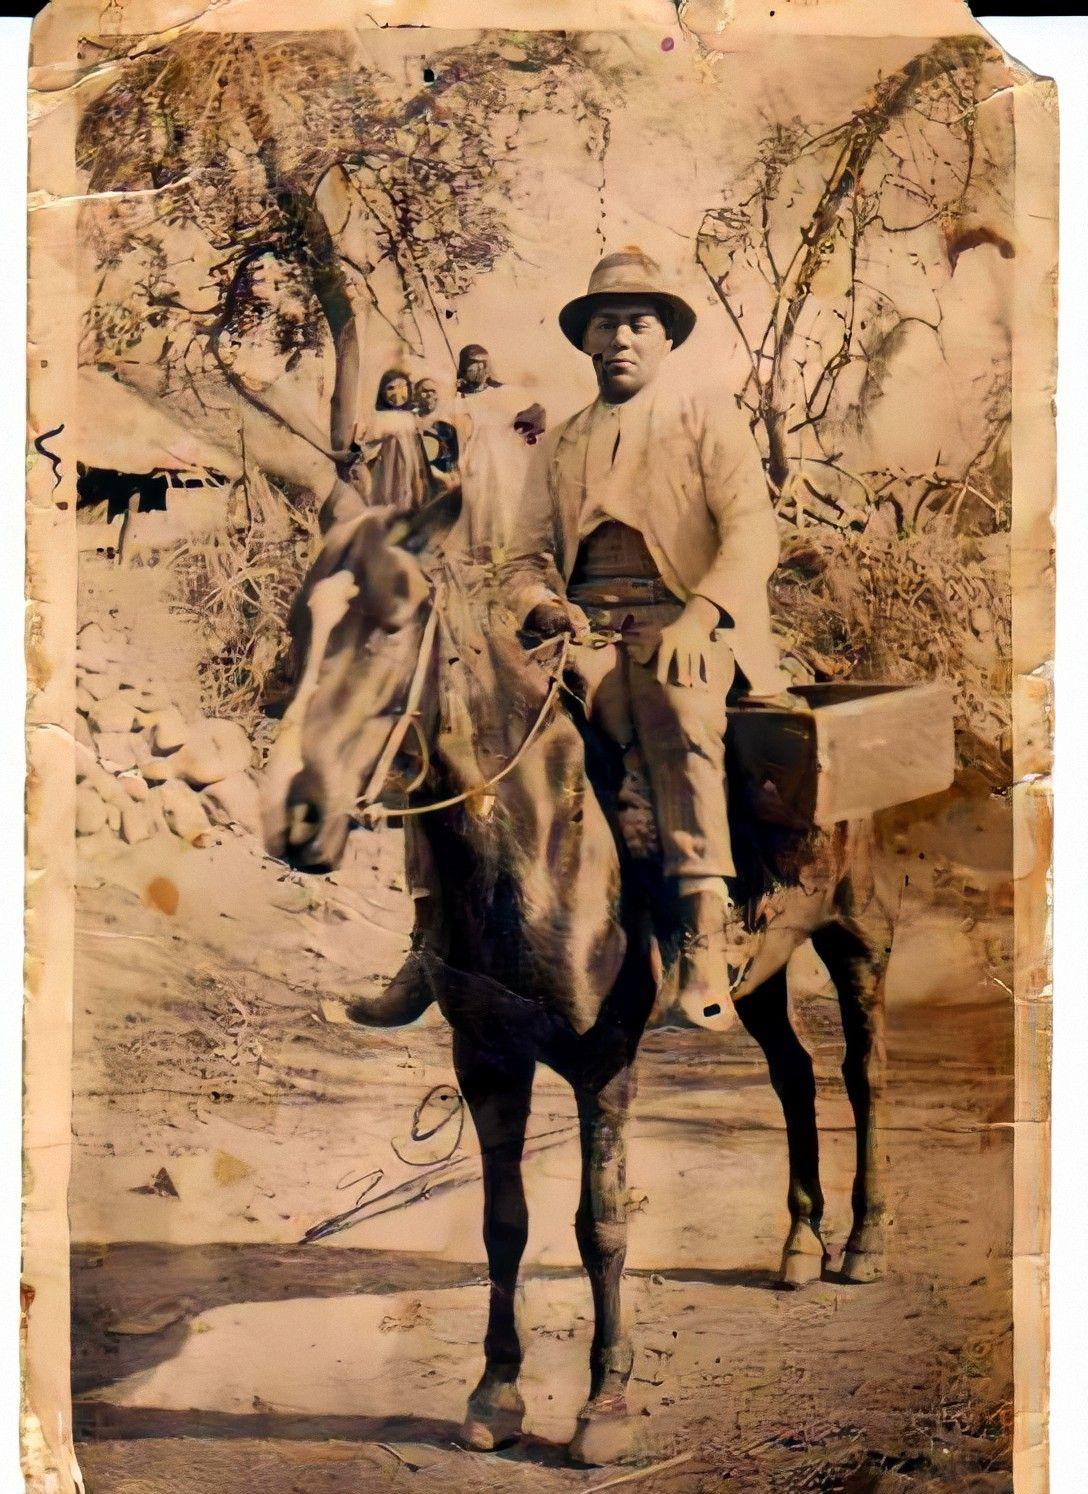 Enterreno - Fotos históricas de chile - fotos antiguas de Chile - Vendedor ambulante a caballo, 1914